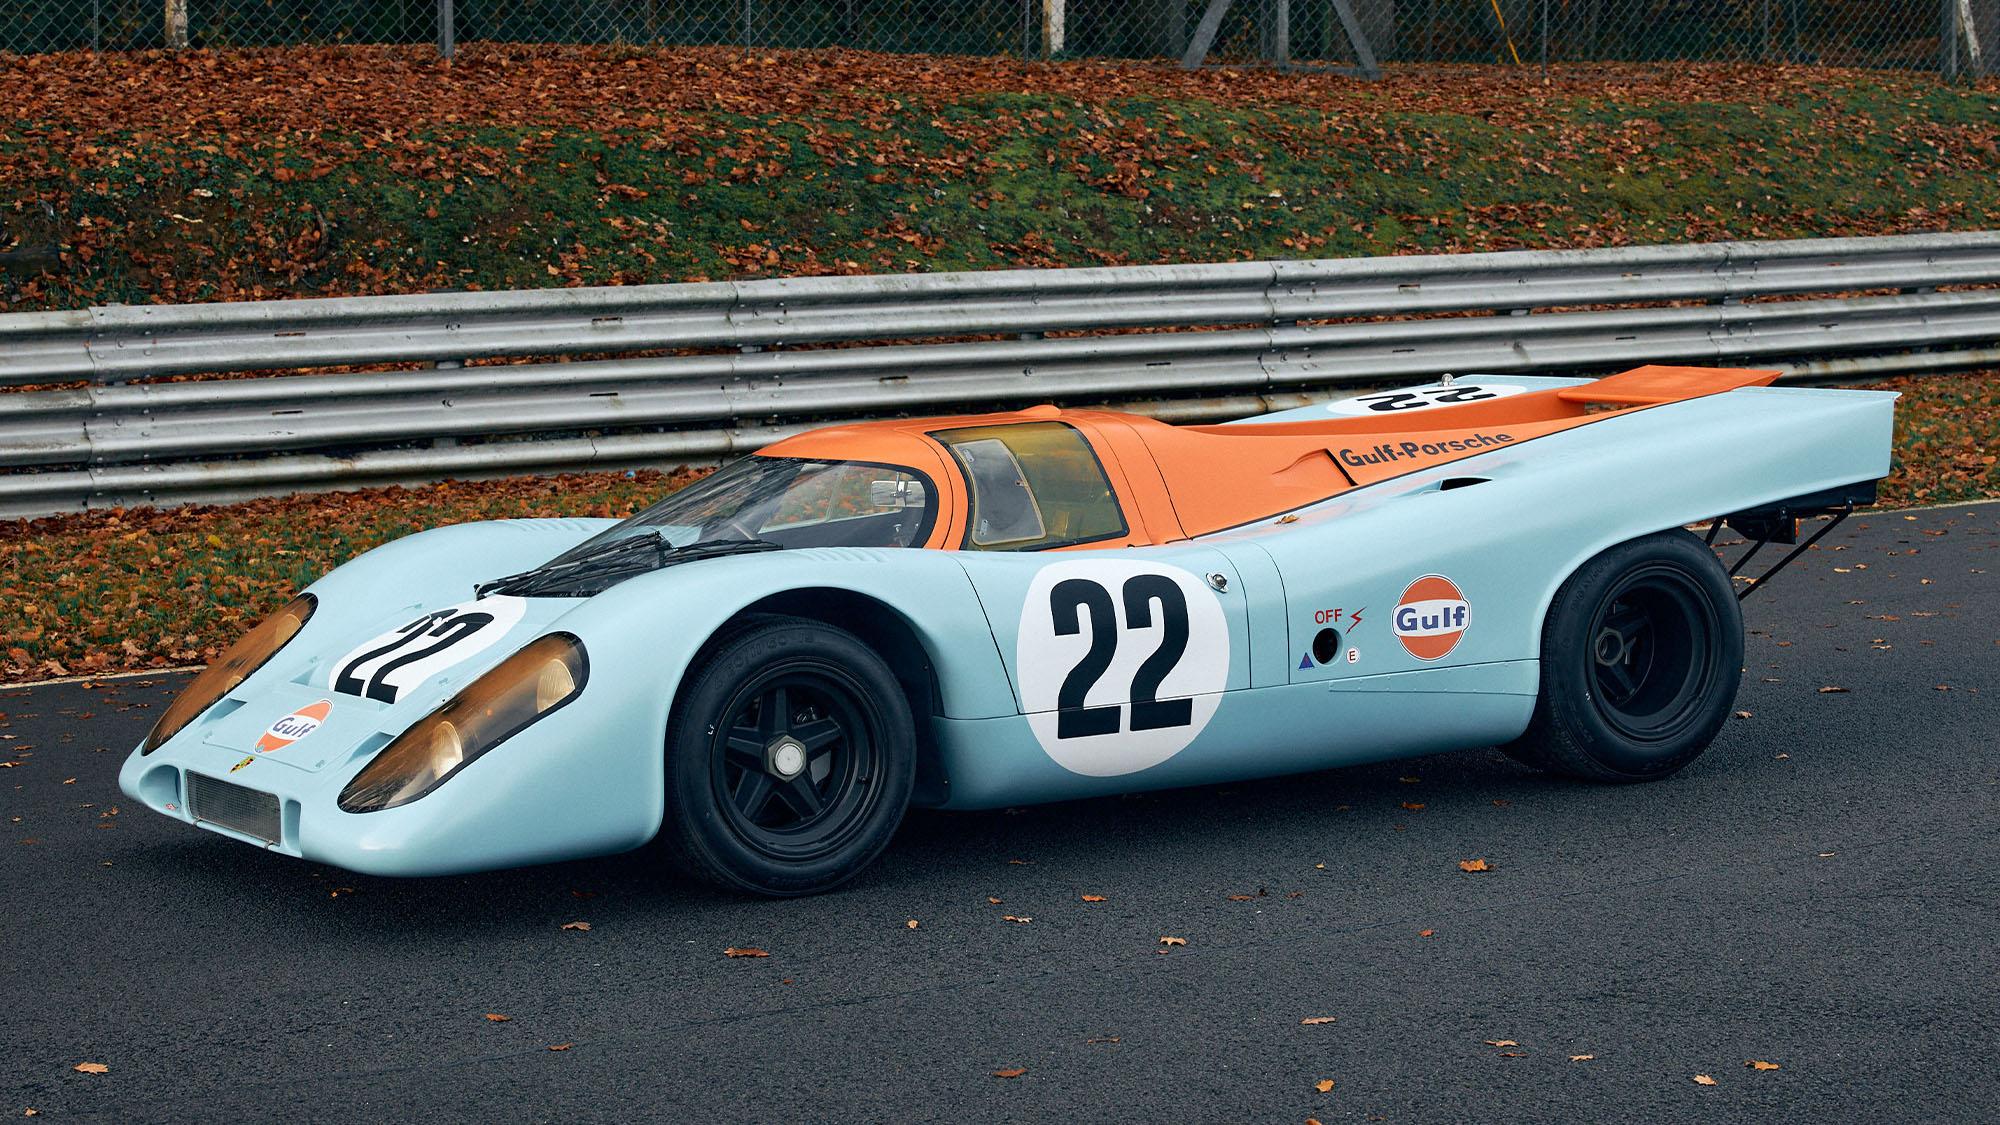 Static view of ex Mike Hailwood Porsche 917K